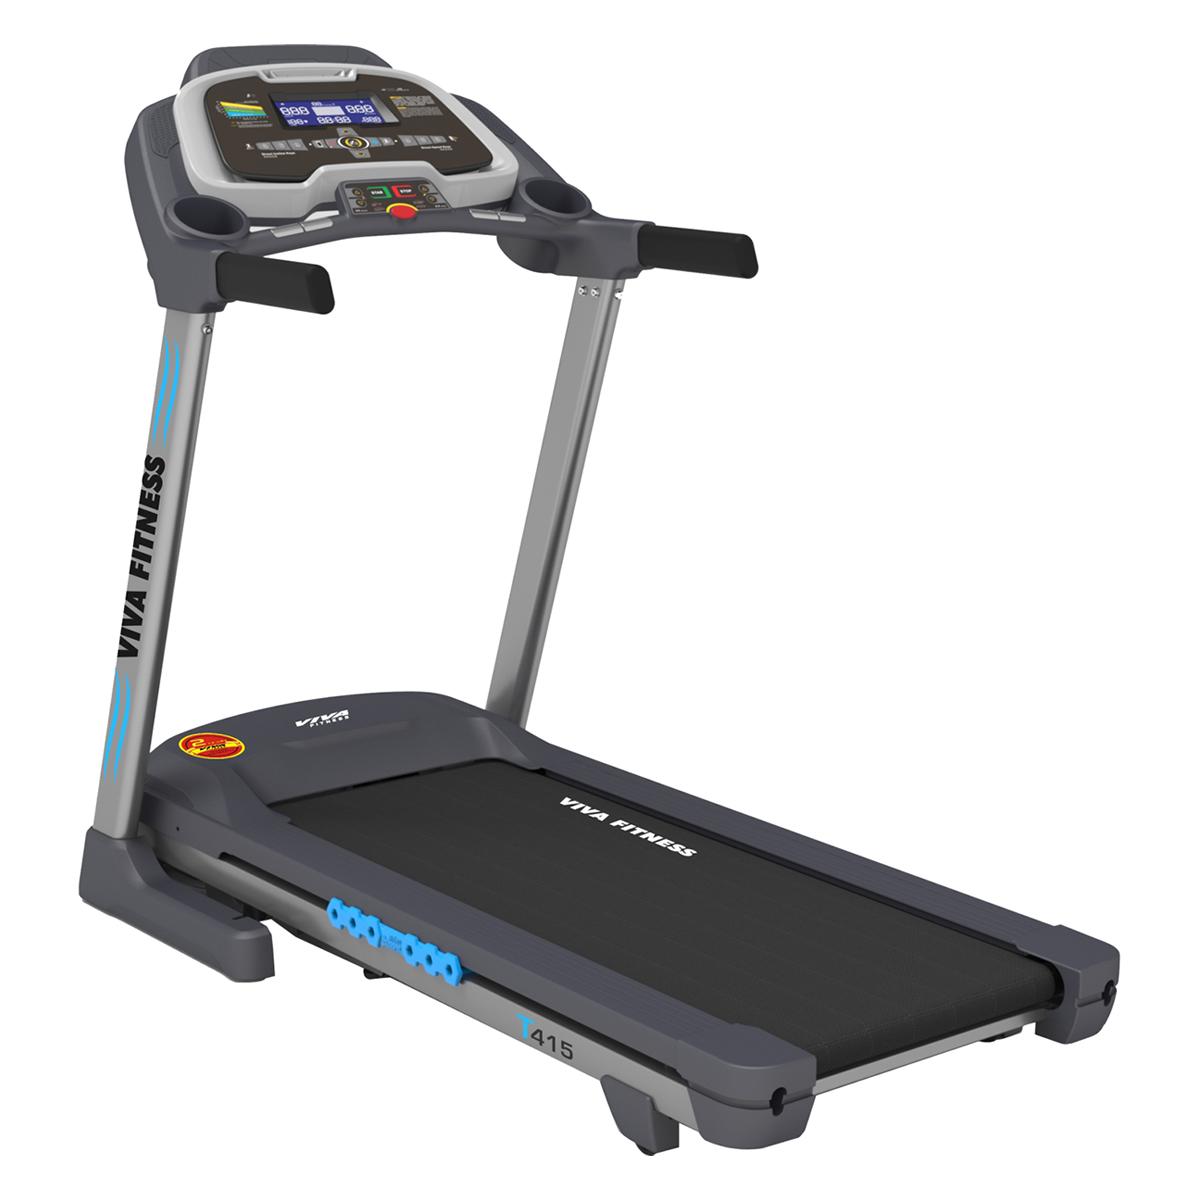 T-415 Motorized Treadmill